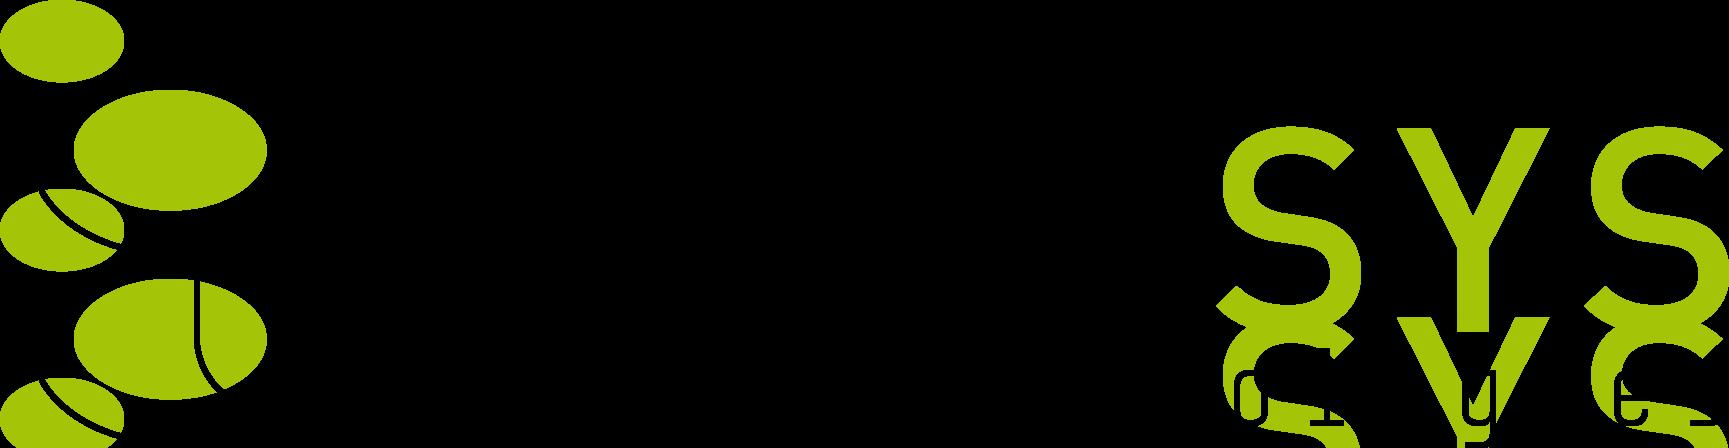 enensys-logo